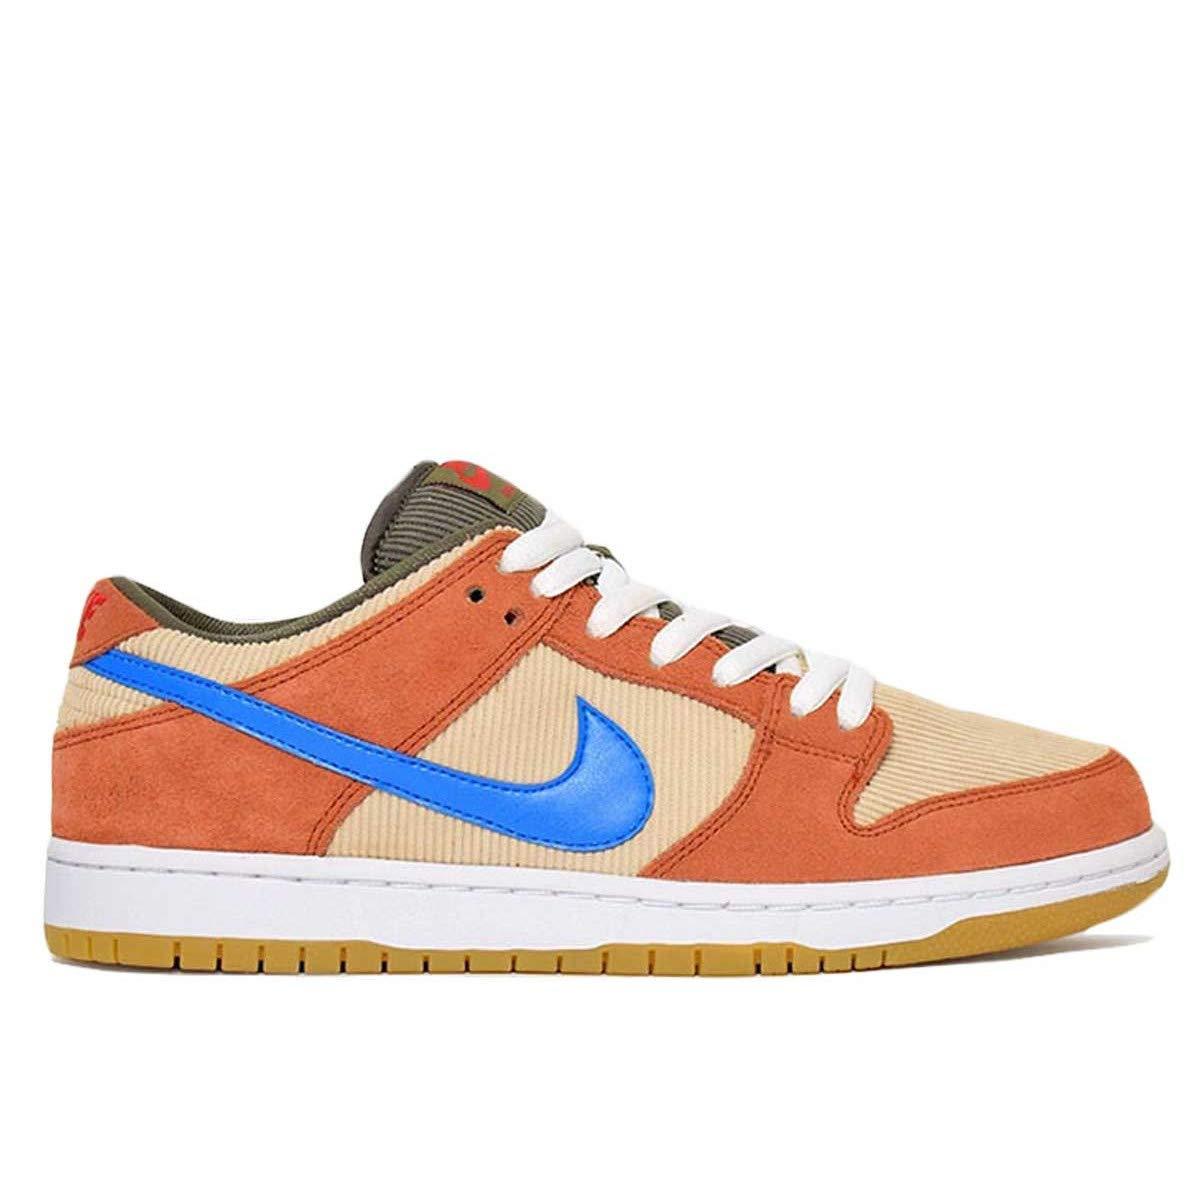 hot sale online c6f21 a9f81 Amazon.com | Nike SB Dunk Low Pro Corduroy (10.5) | Basketball